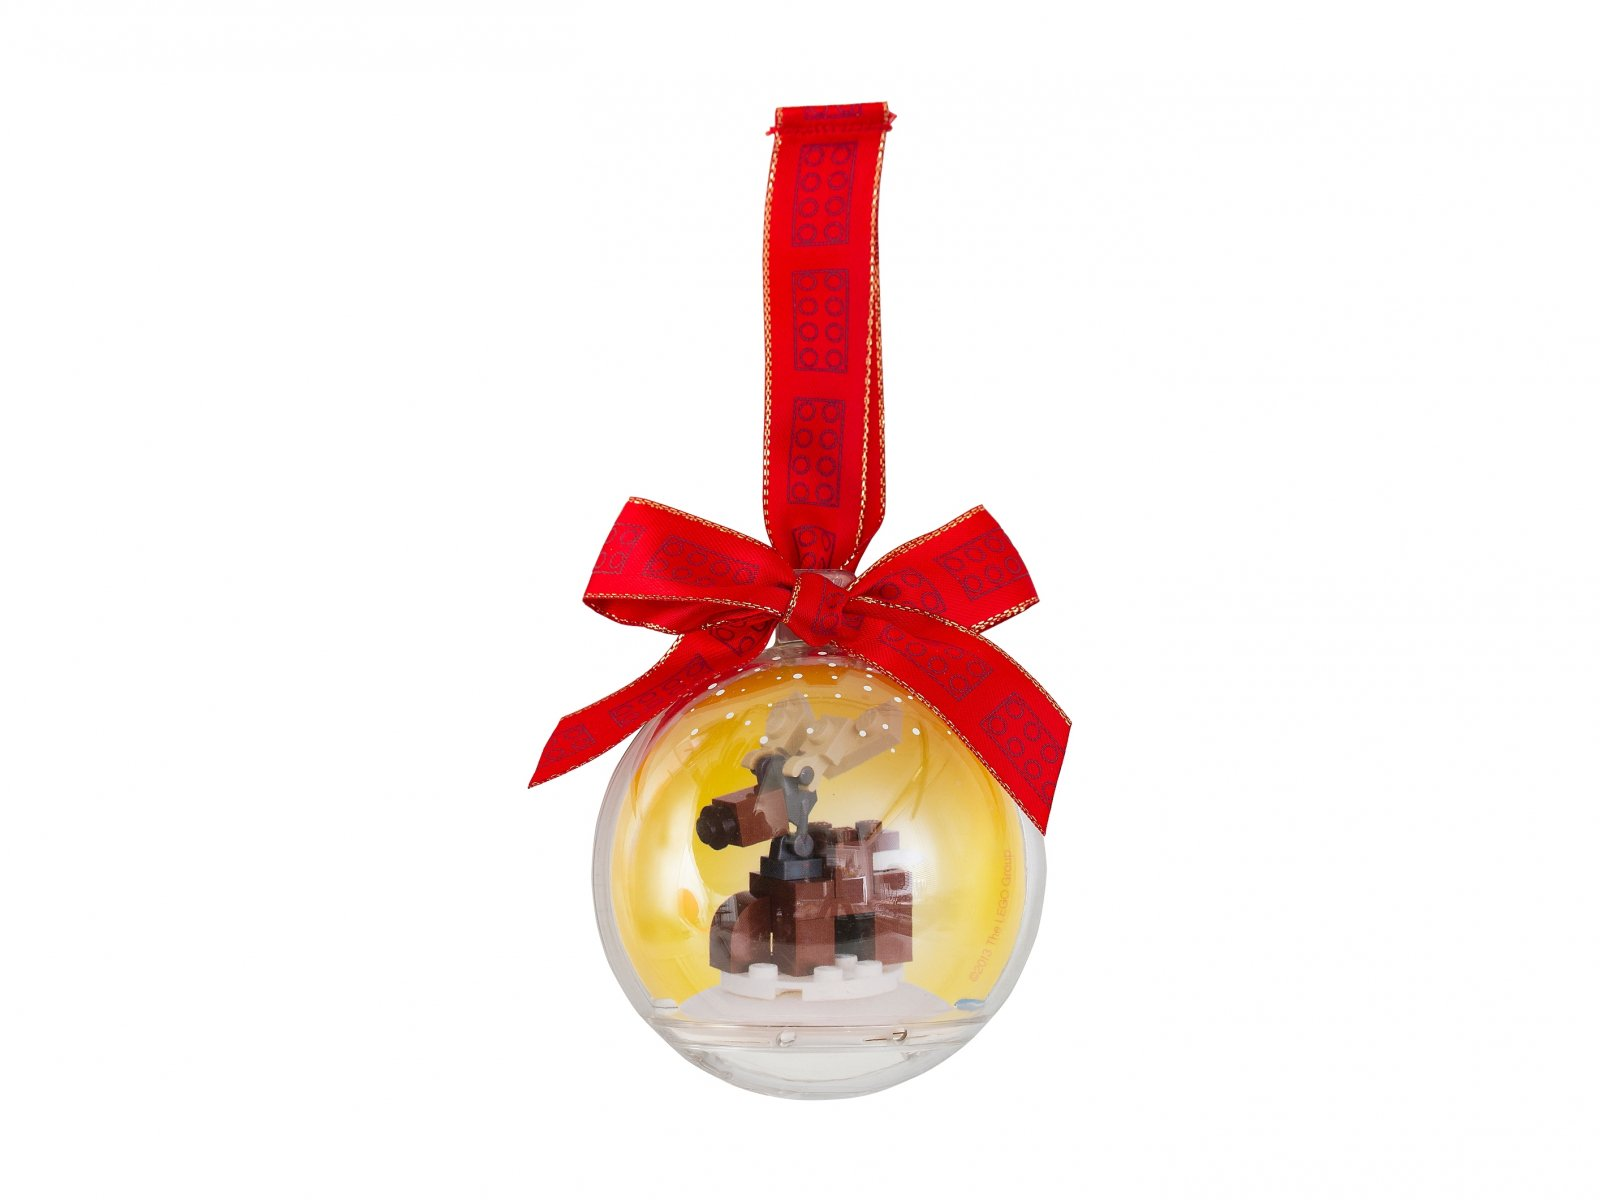 LEGO 850852 Reindeer Holiday Bauble